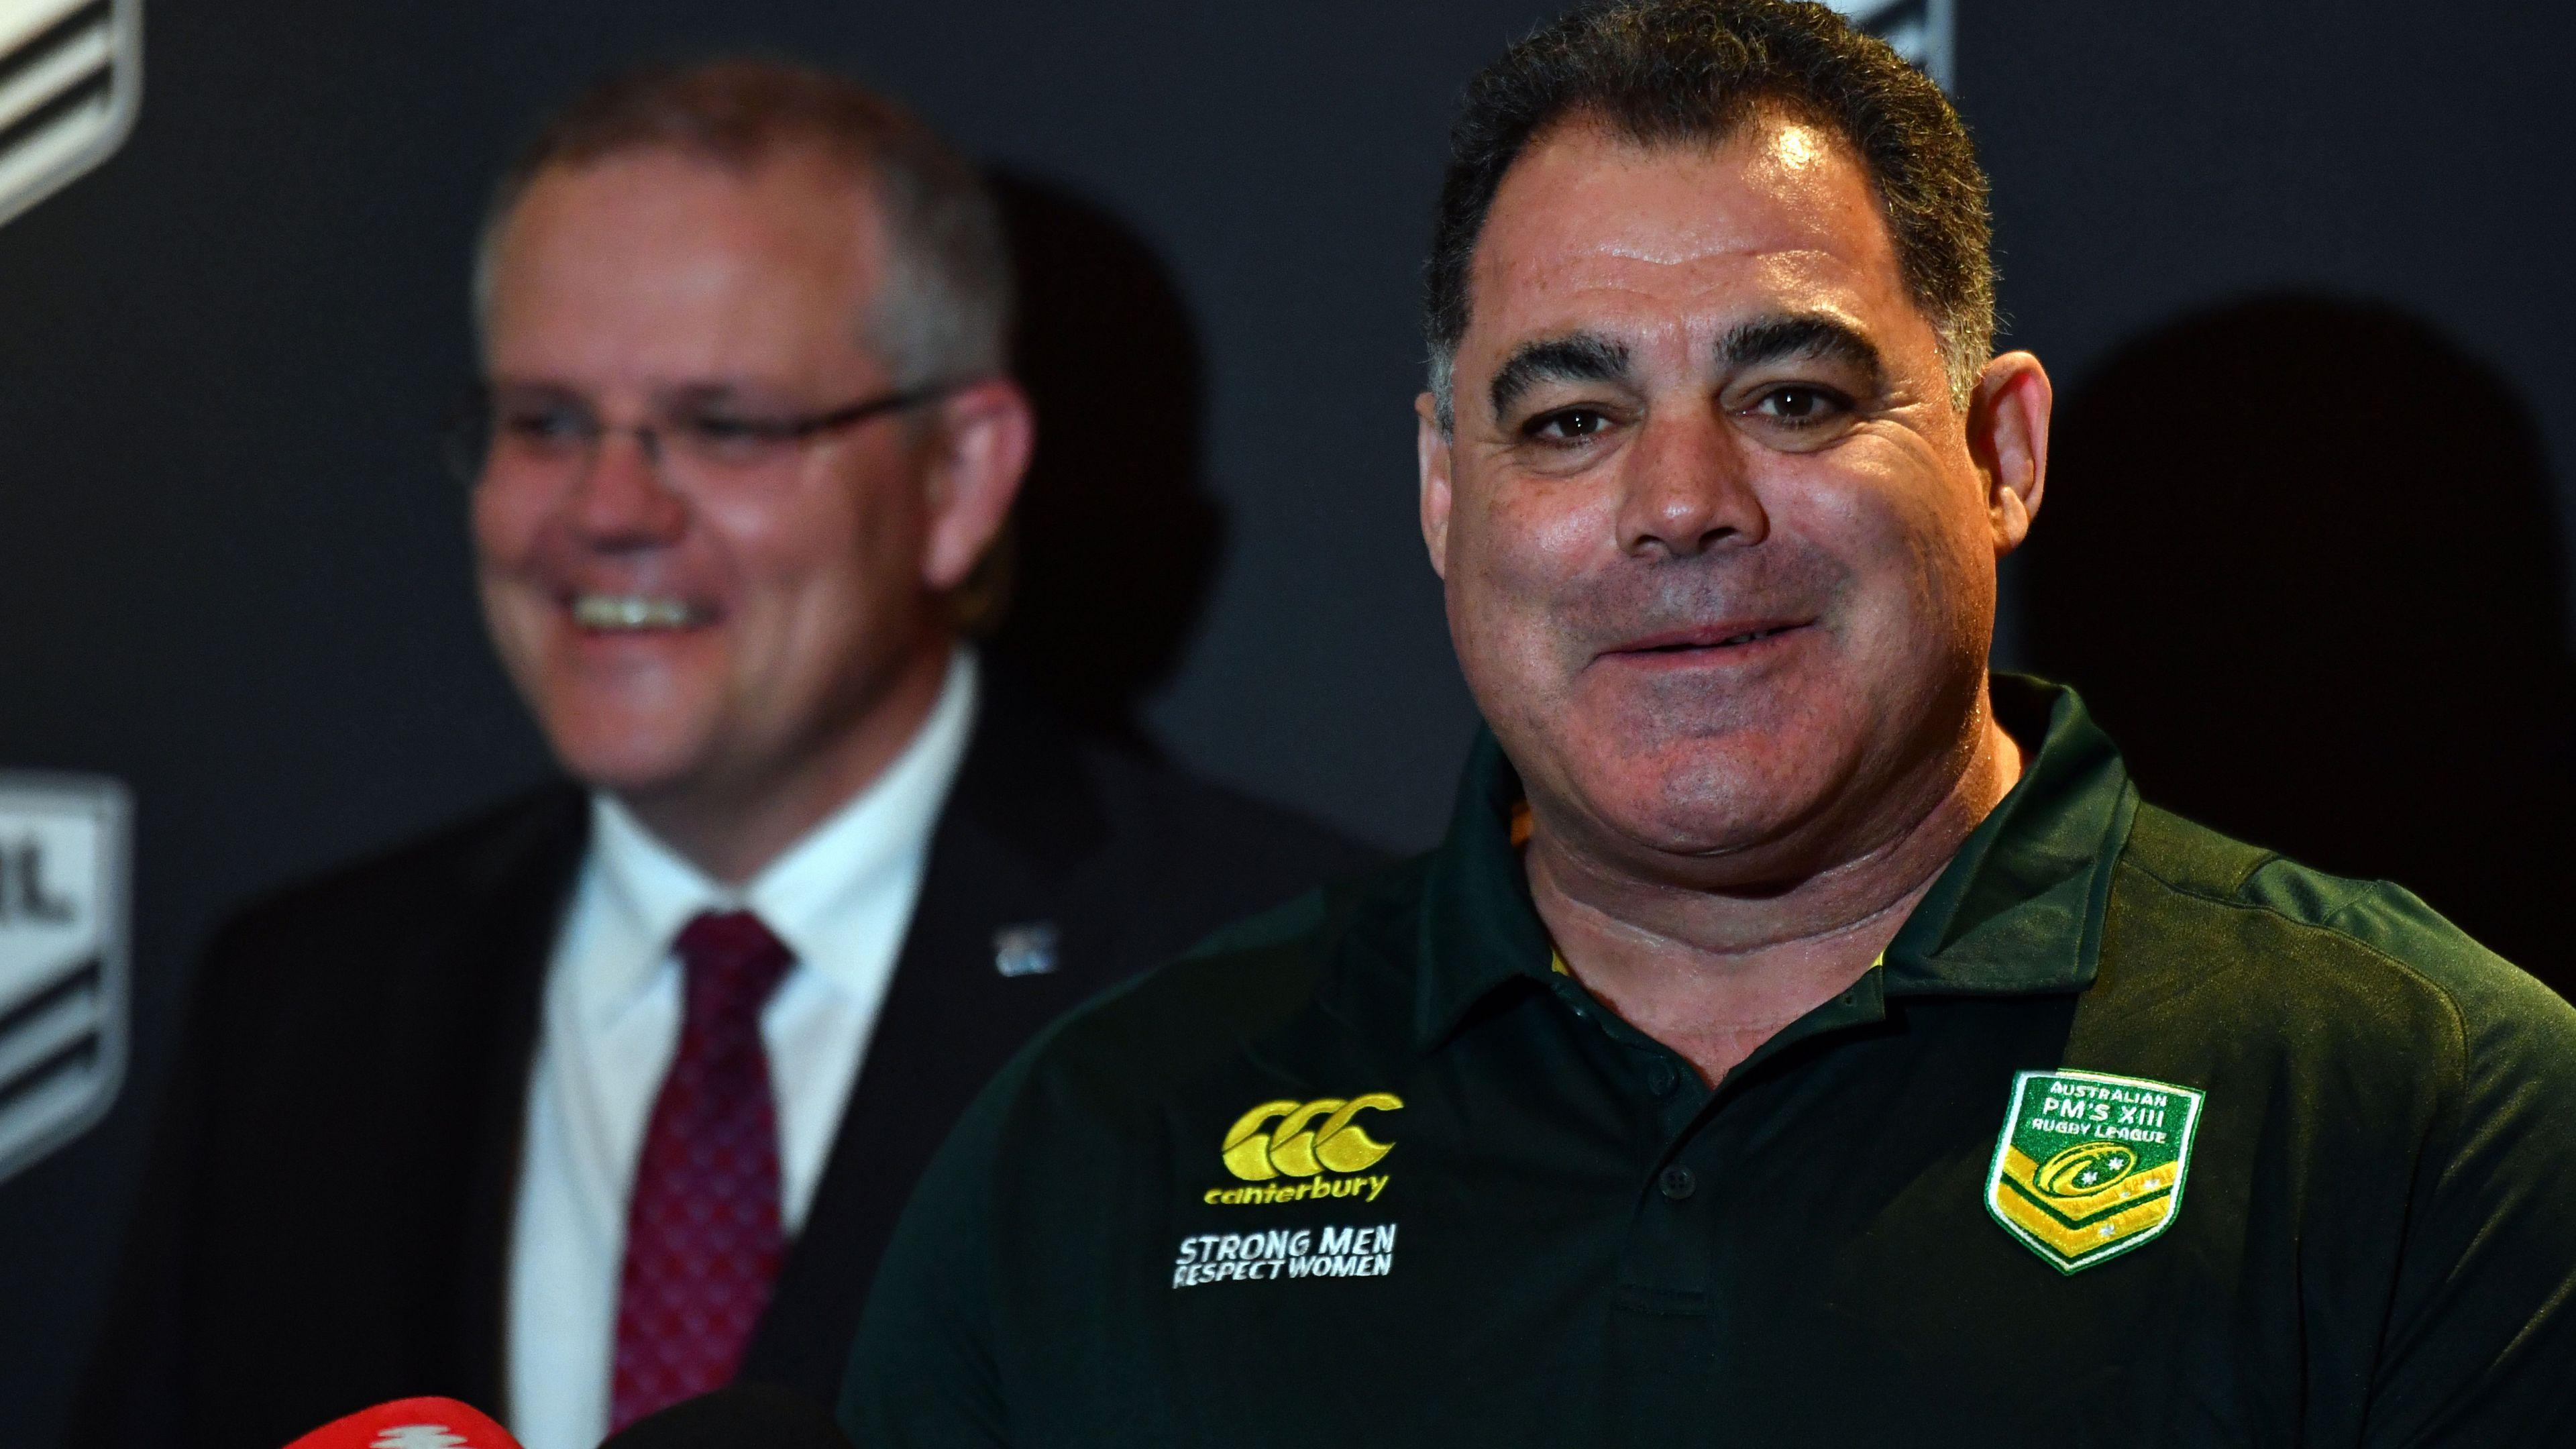 Mal Meninga names Greg Inglis to lead new look Kangaroos side